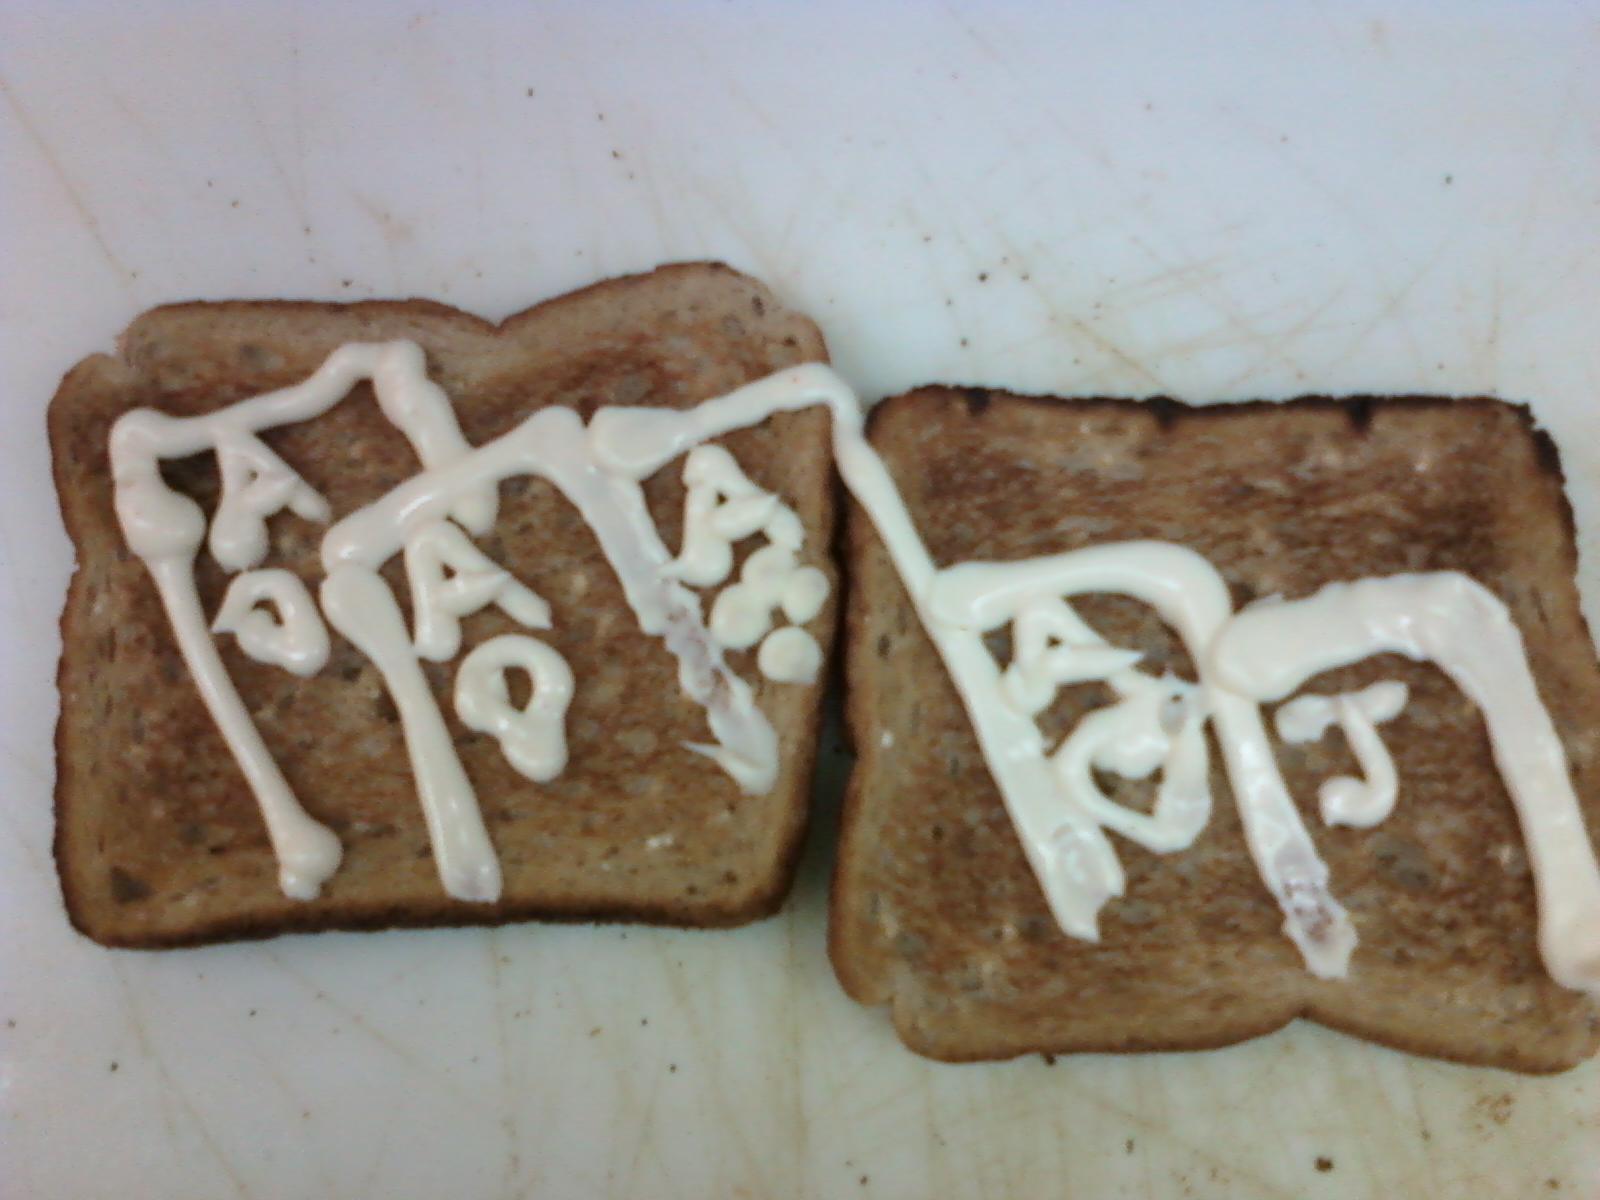 sandwich_art/0902111013.jpg